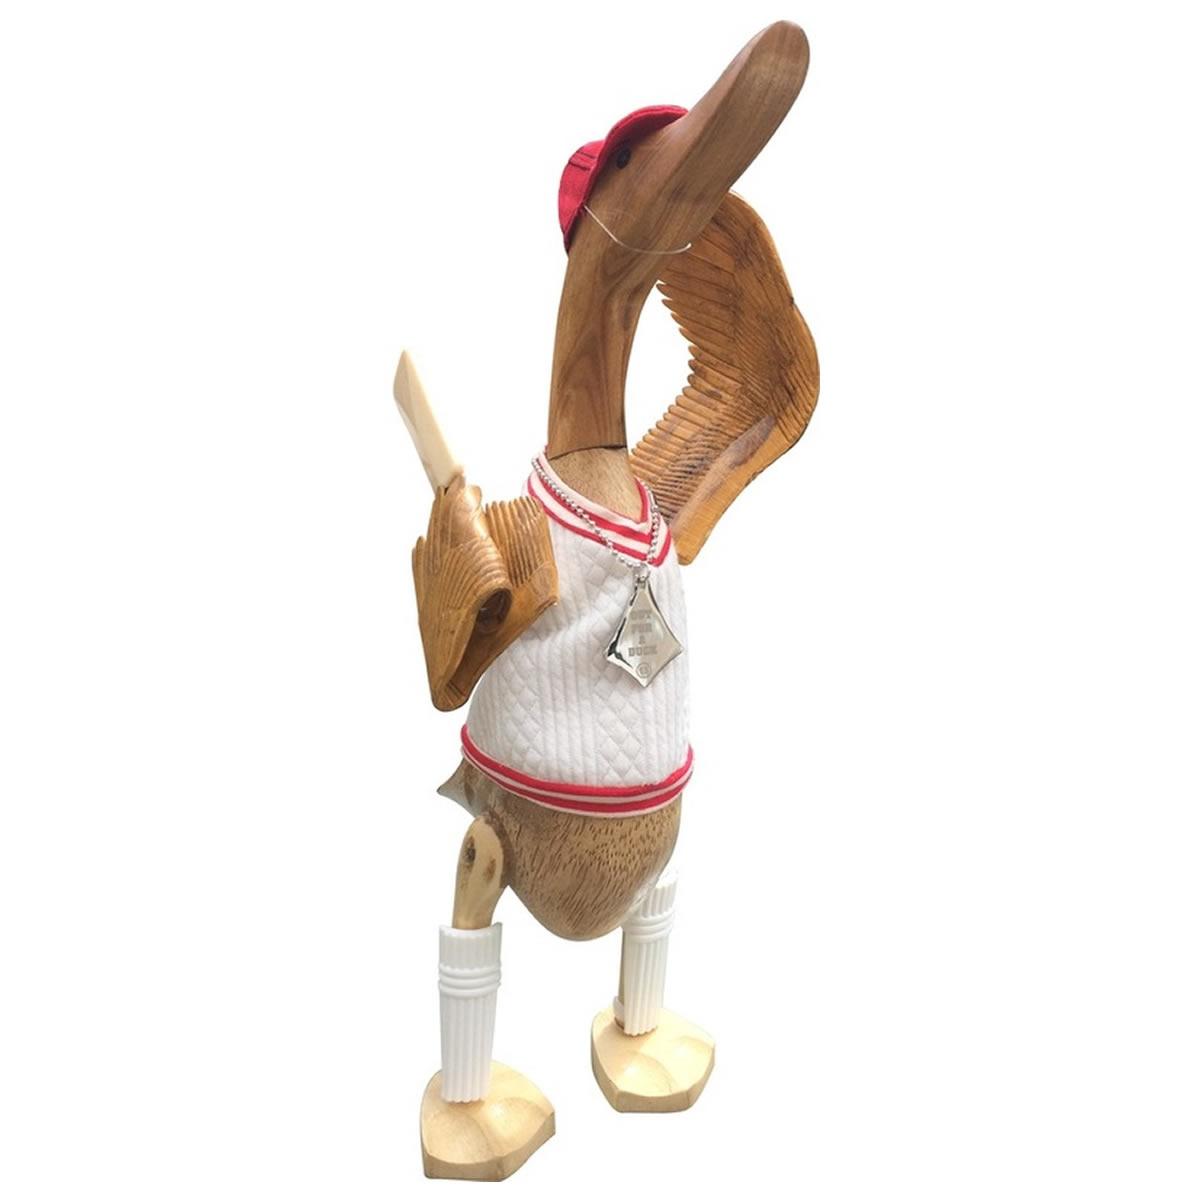 Cricketer Wooden Duck Ornament